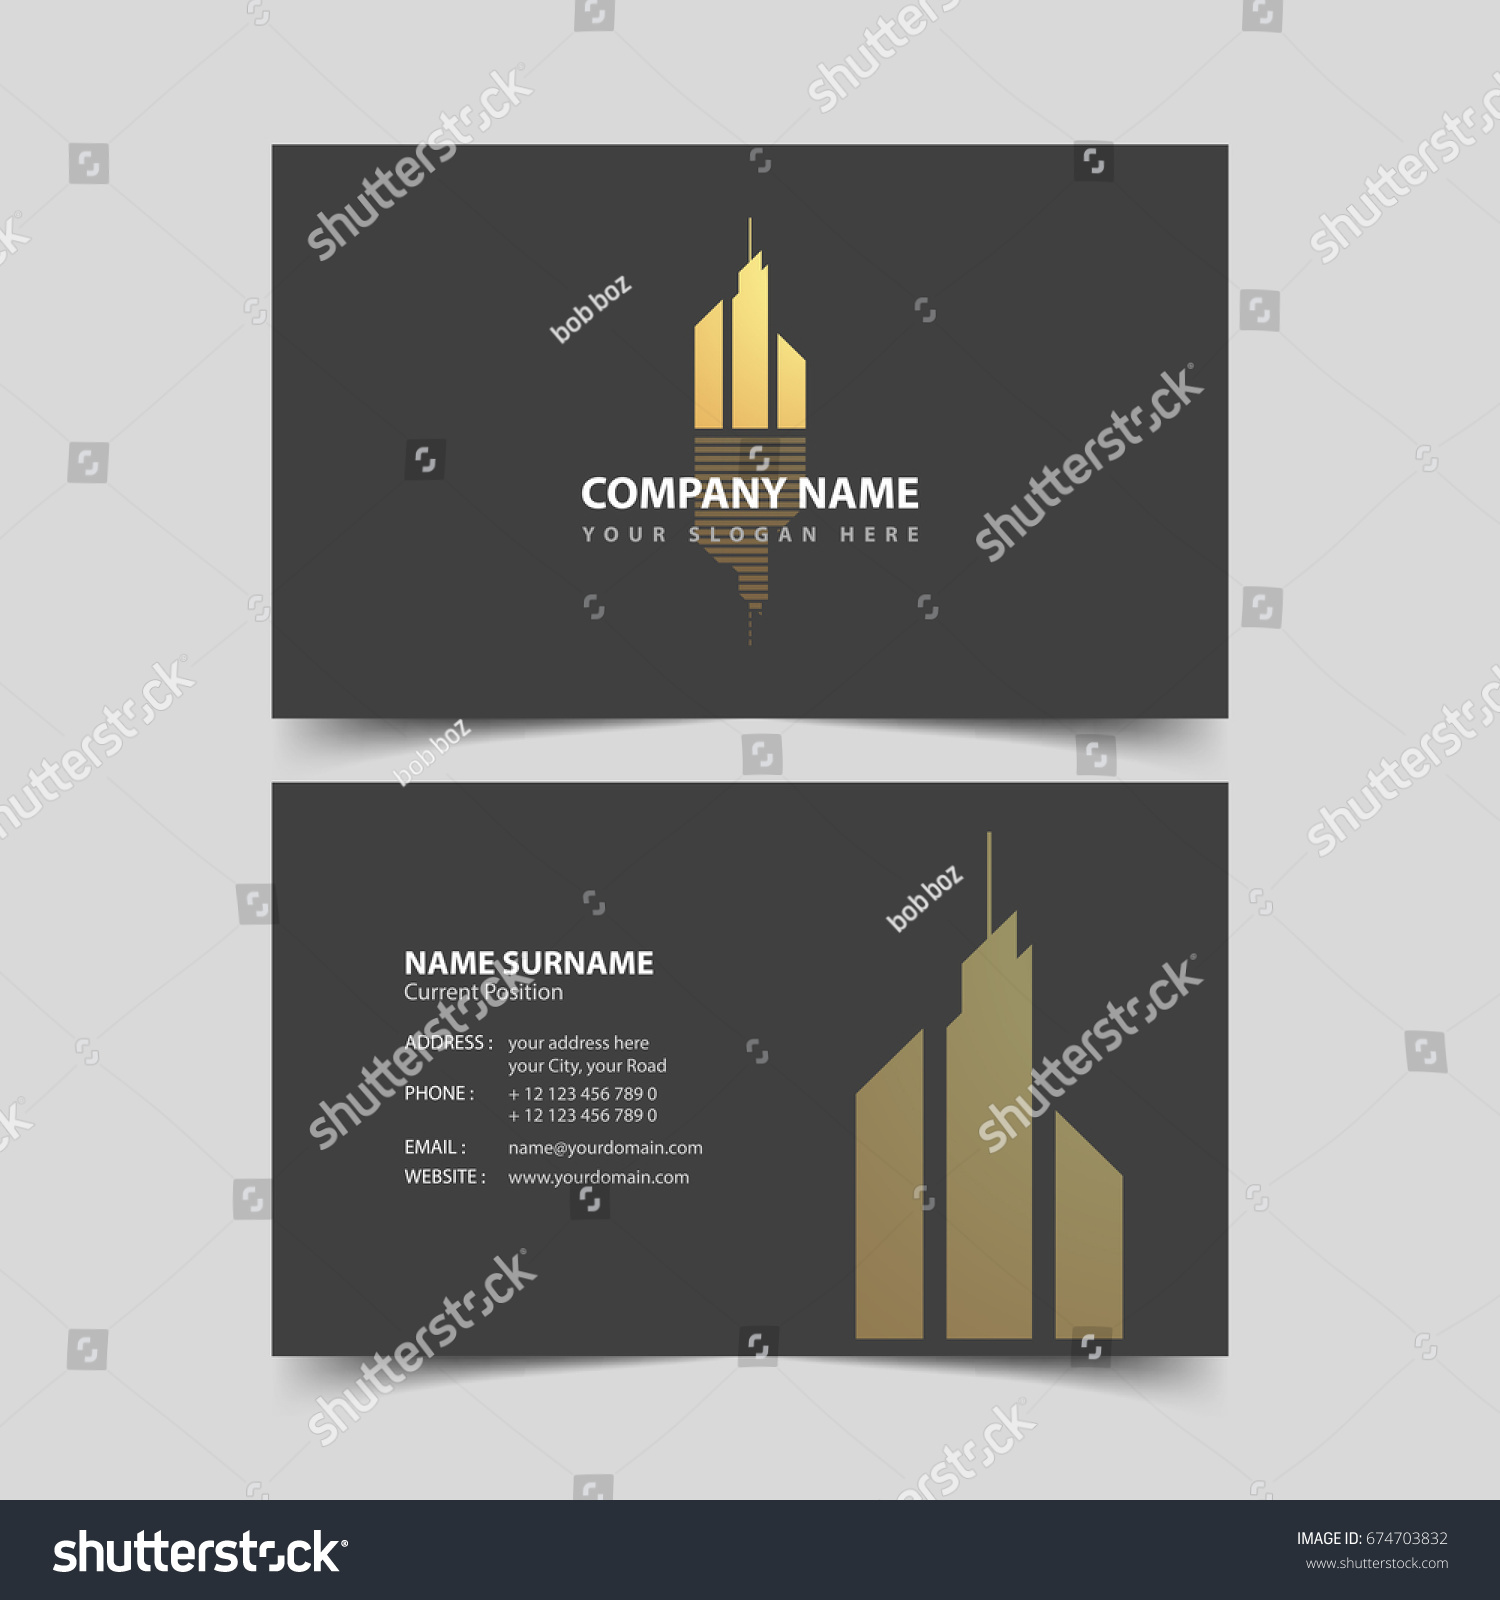 Realtor Business Card Design Template Stock Photo (Photo, Vector ...